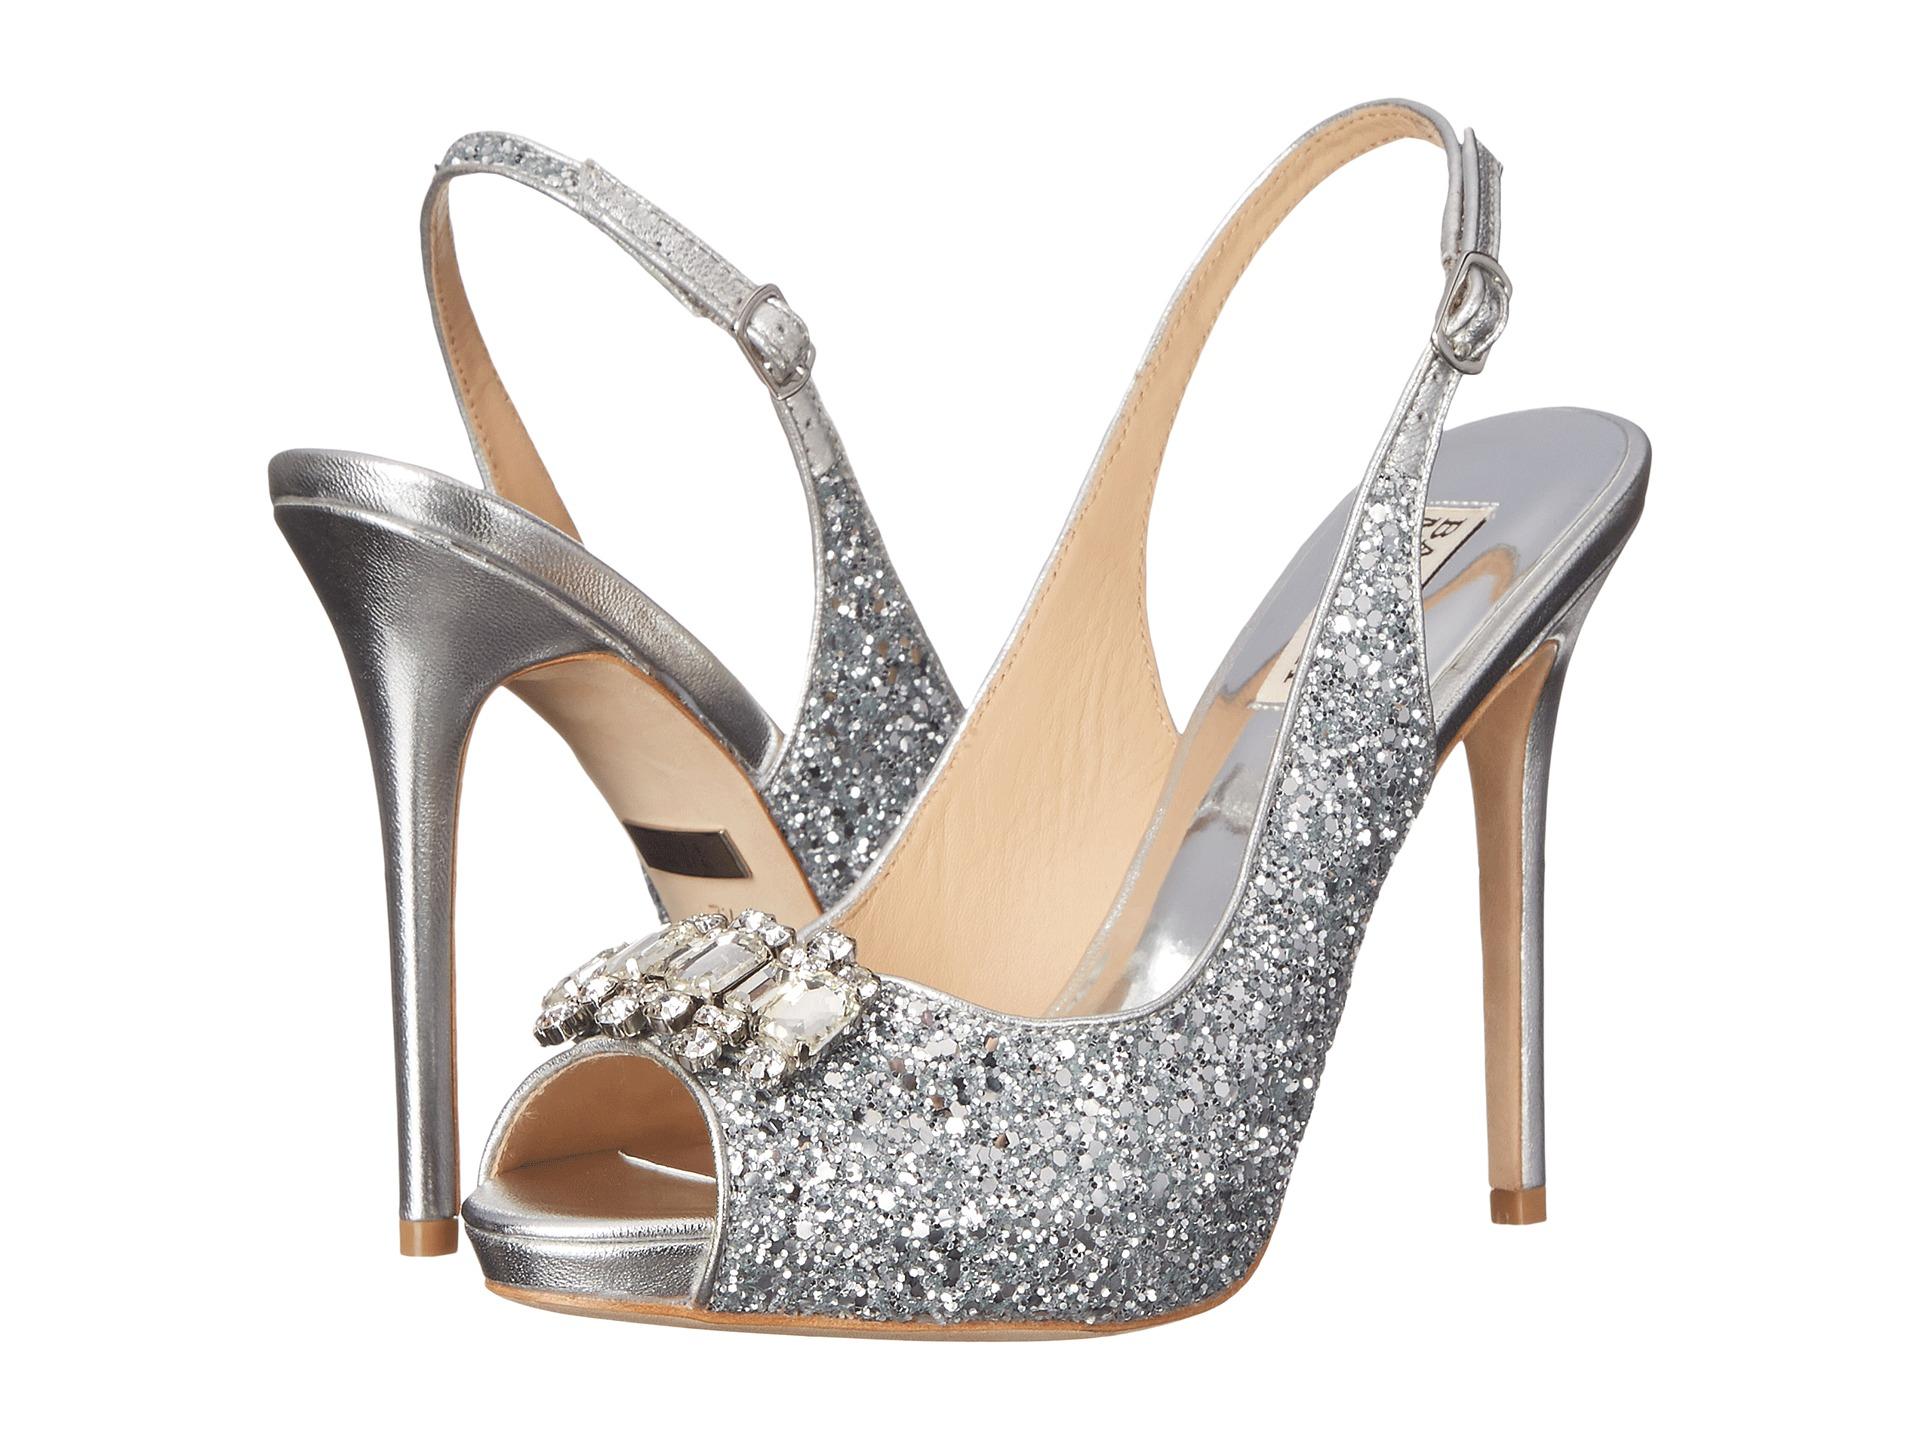 Lyst Badgley Mischka Clark Embellished Ankle Strap